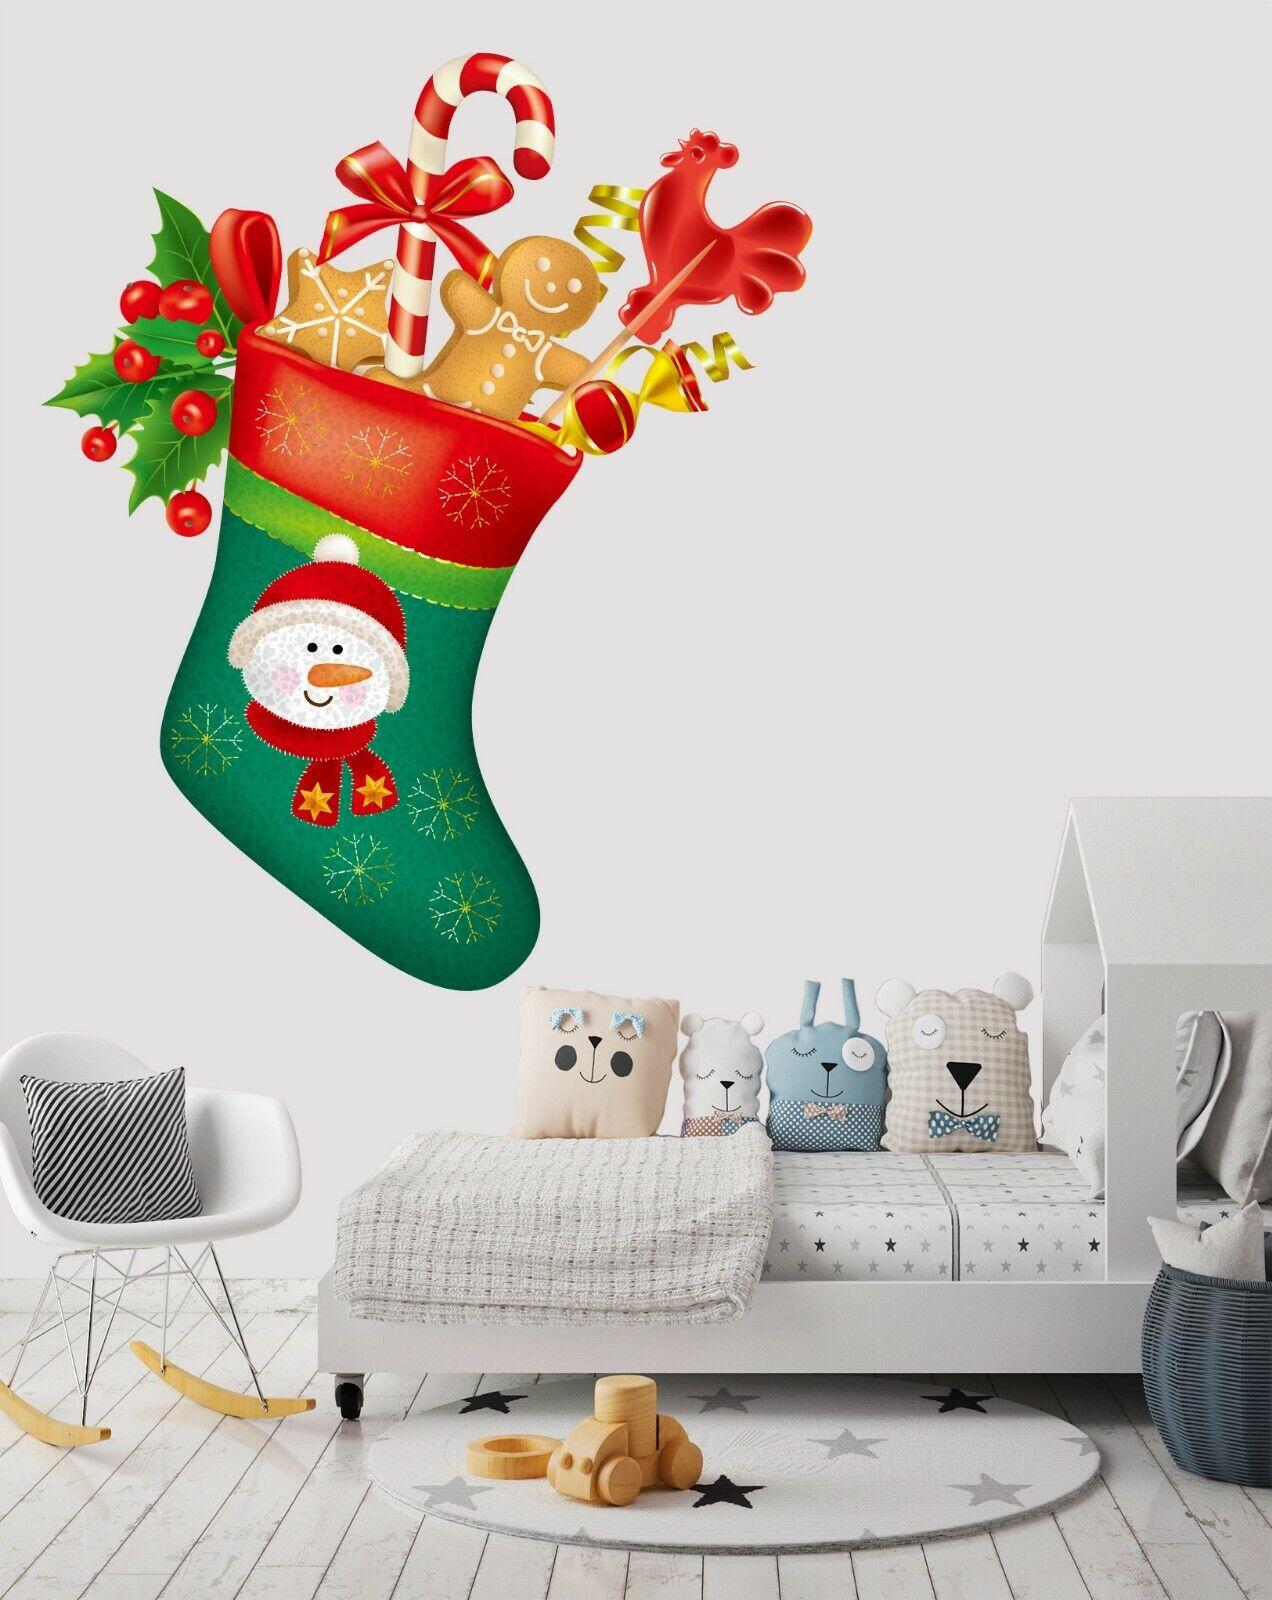 3D Socks Gift I428 Christmas Wallpaper Murals Wall Print Decal Wall Sticker Amy